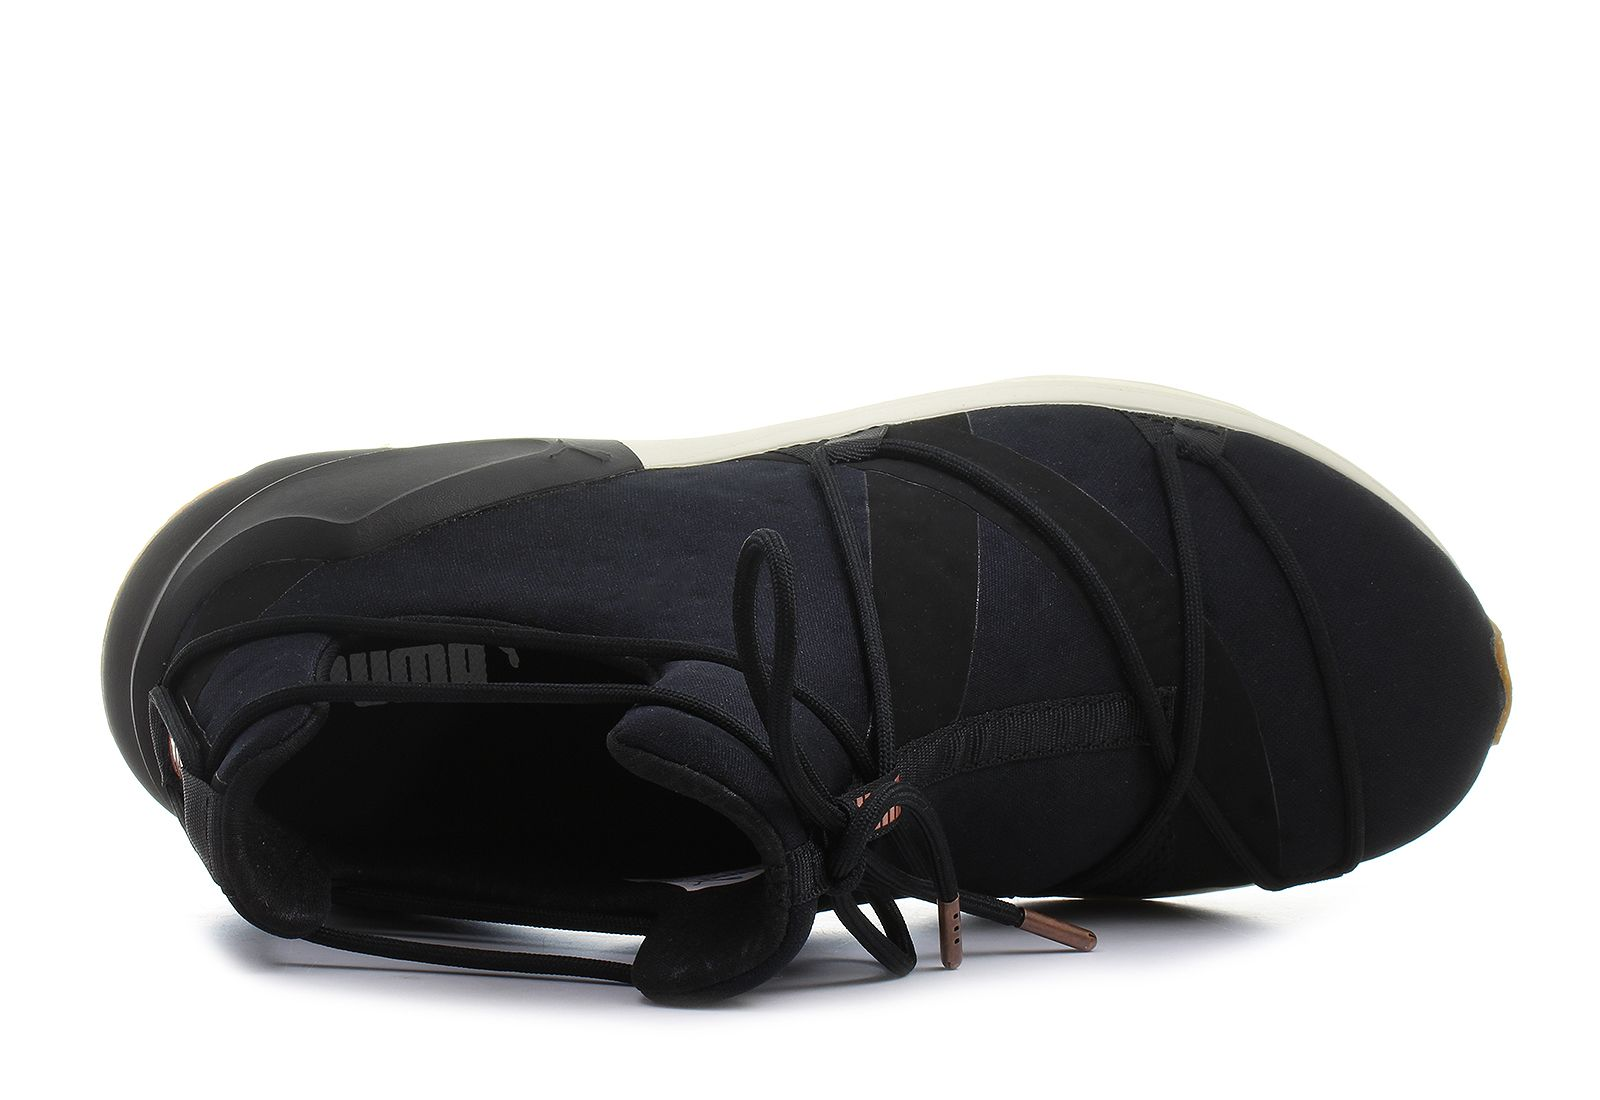 Corde Puma Femmes Chaussures De Sport Féroce Vr 44mF9Q